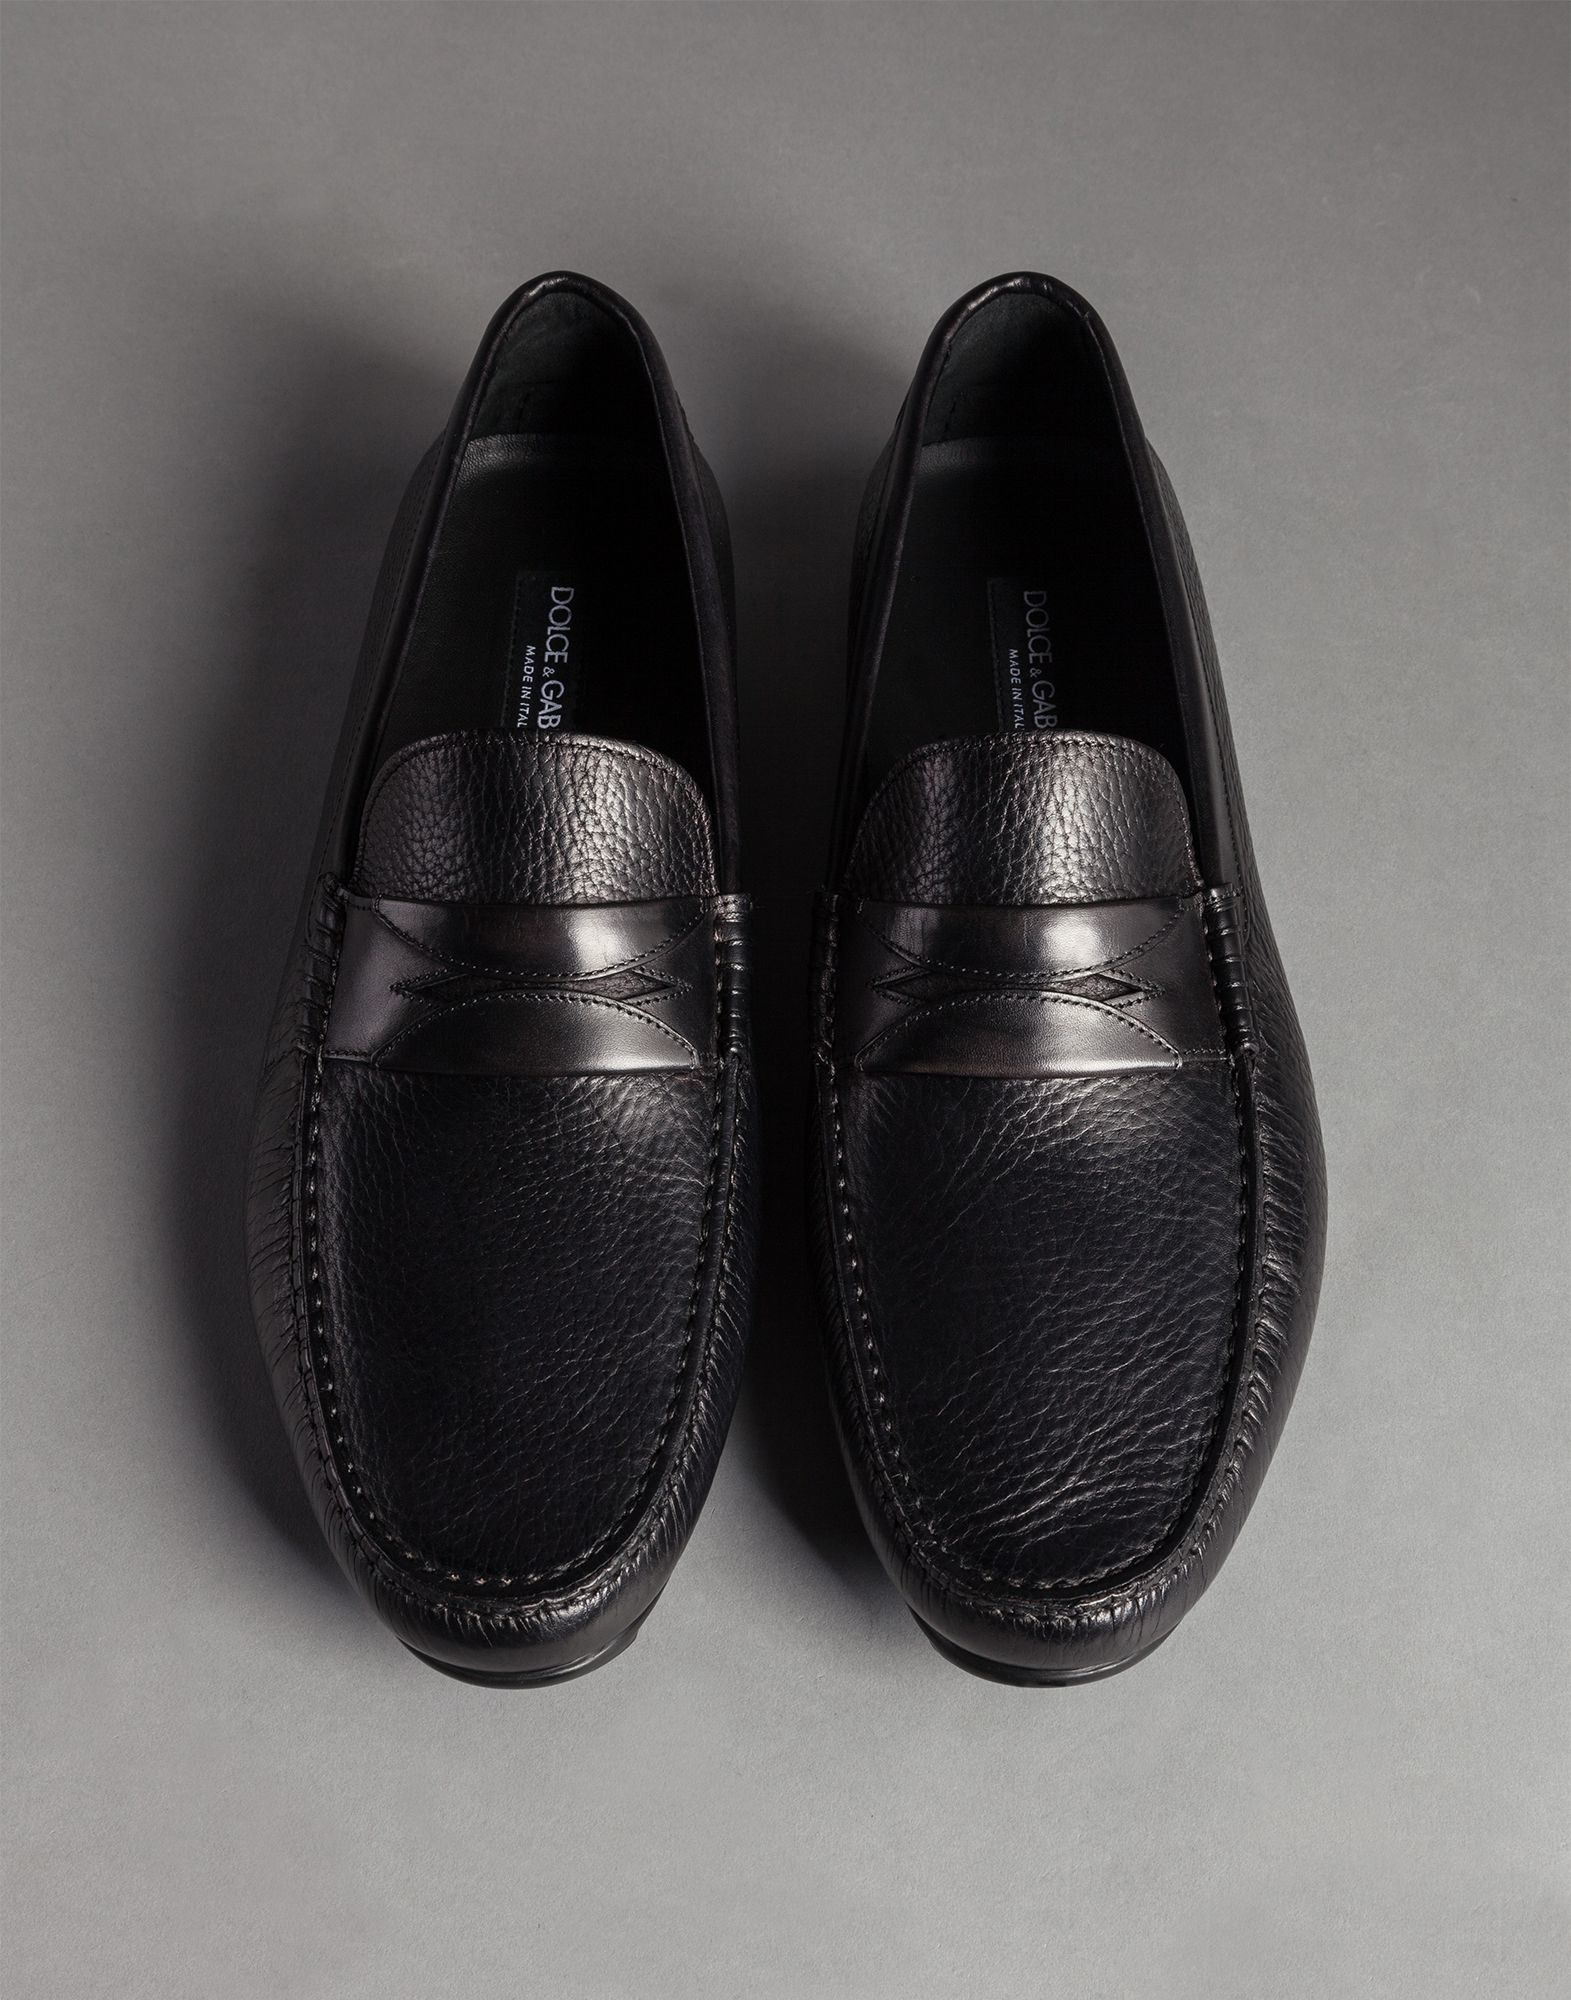 9badfcc179ea Dolce & Gabbana Matisse Calfskin Ragusa Driving Shoes in Black for ...